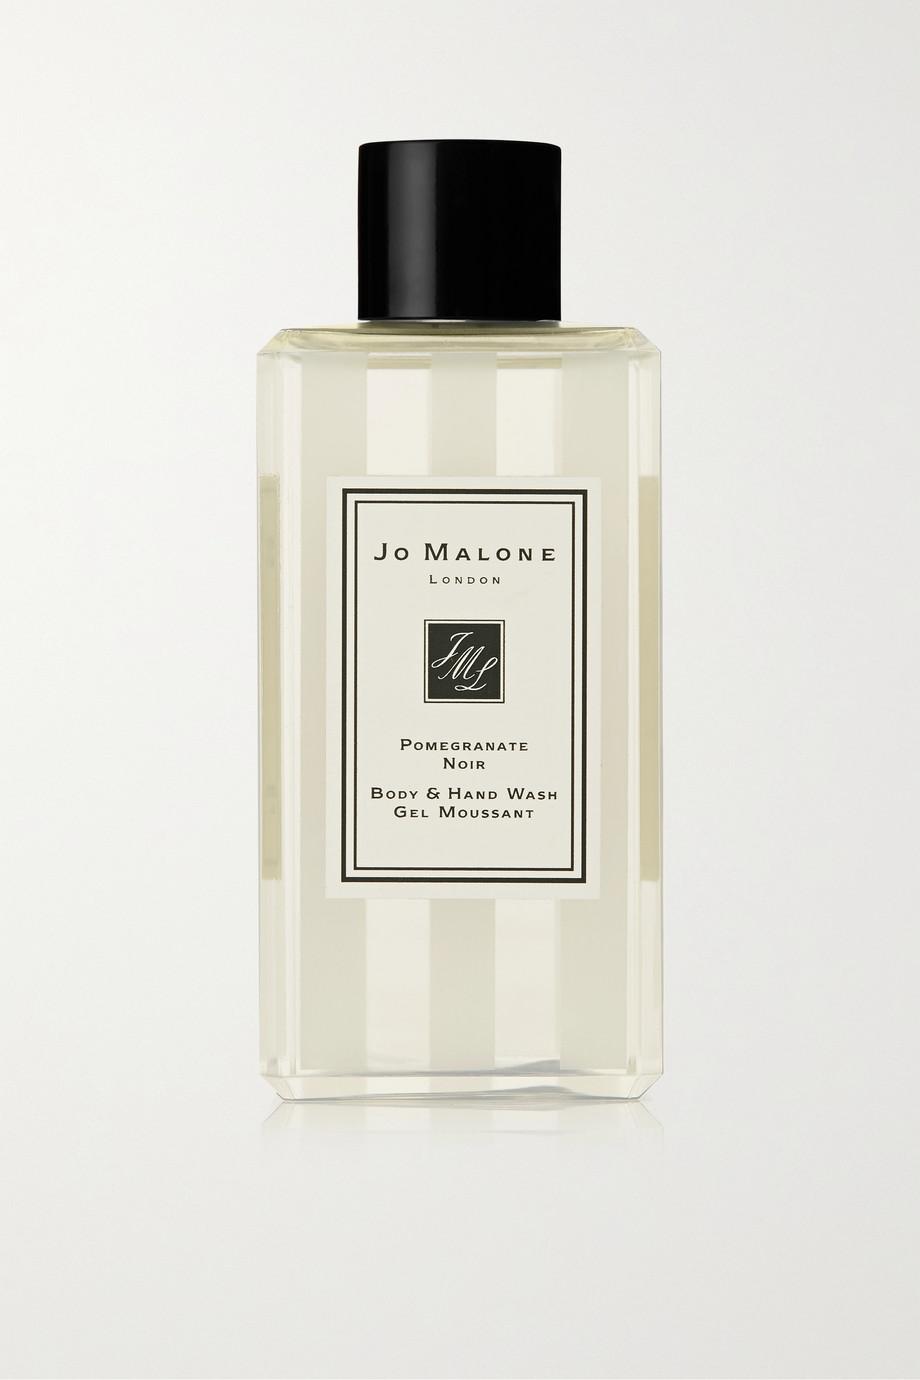 Jo Malone London Pomegranate Noir Body & Hand Wash, 100ml